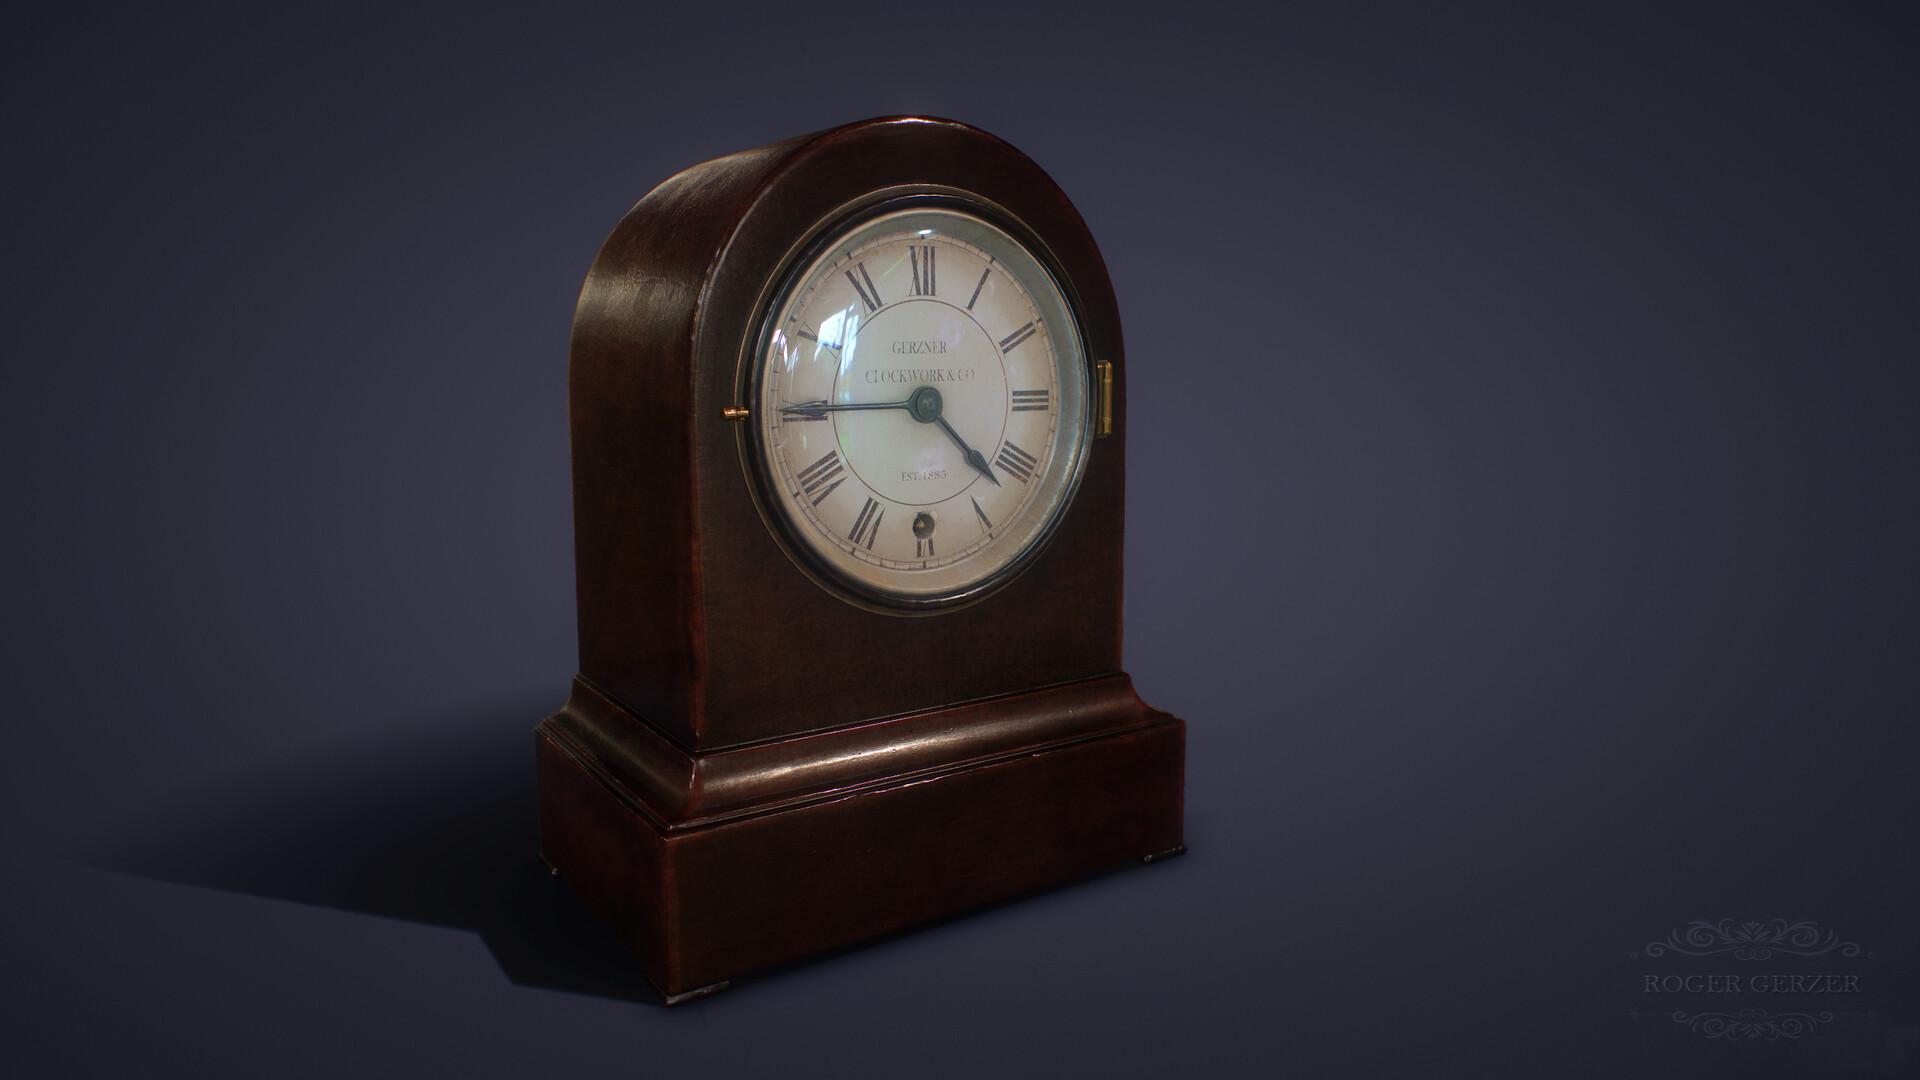 Roger gerzner victorian mantel clock